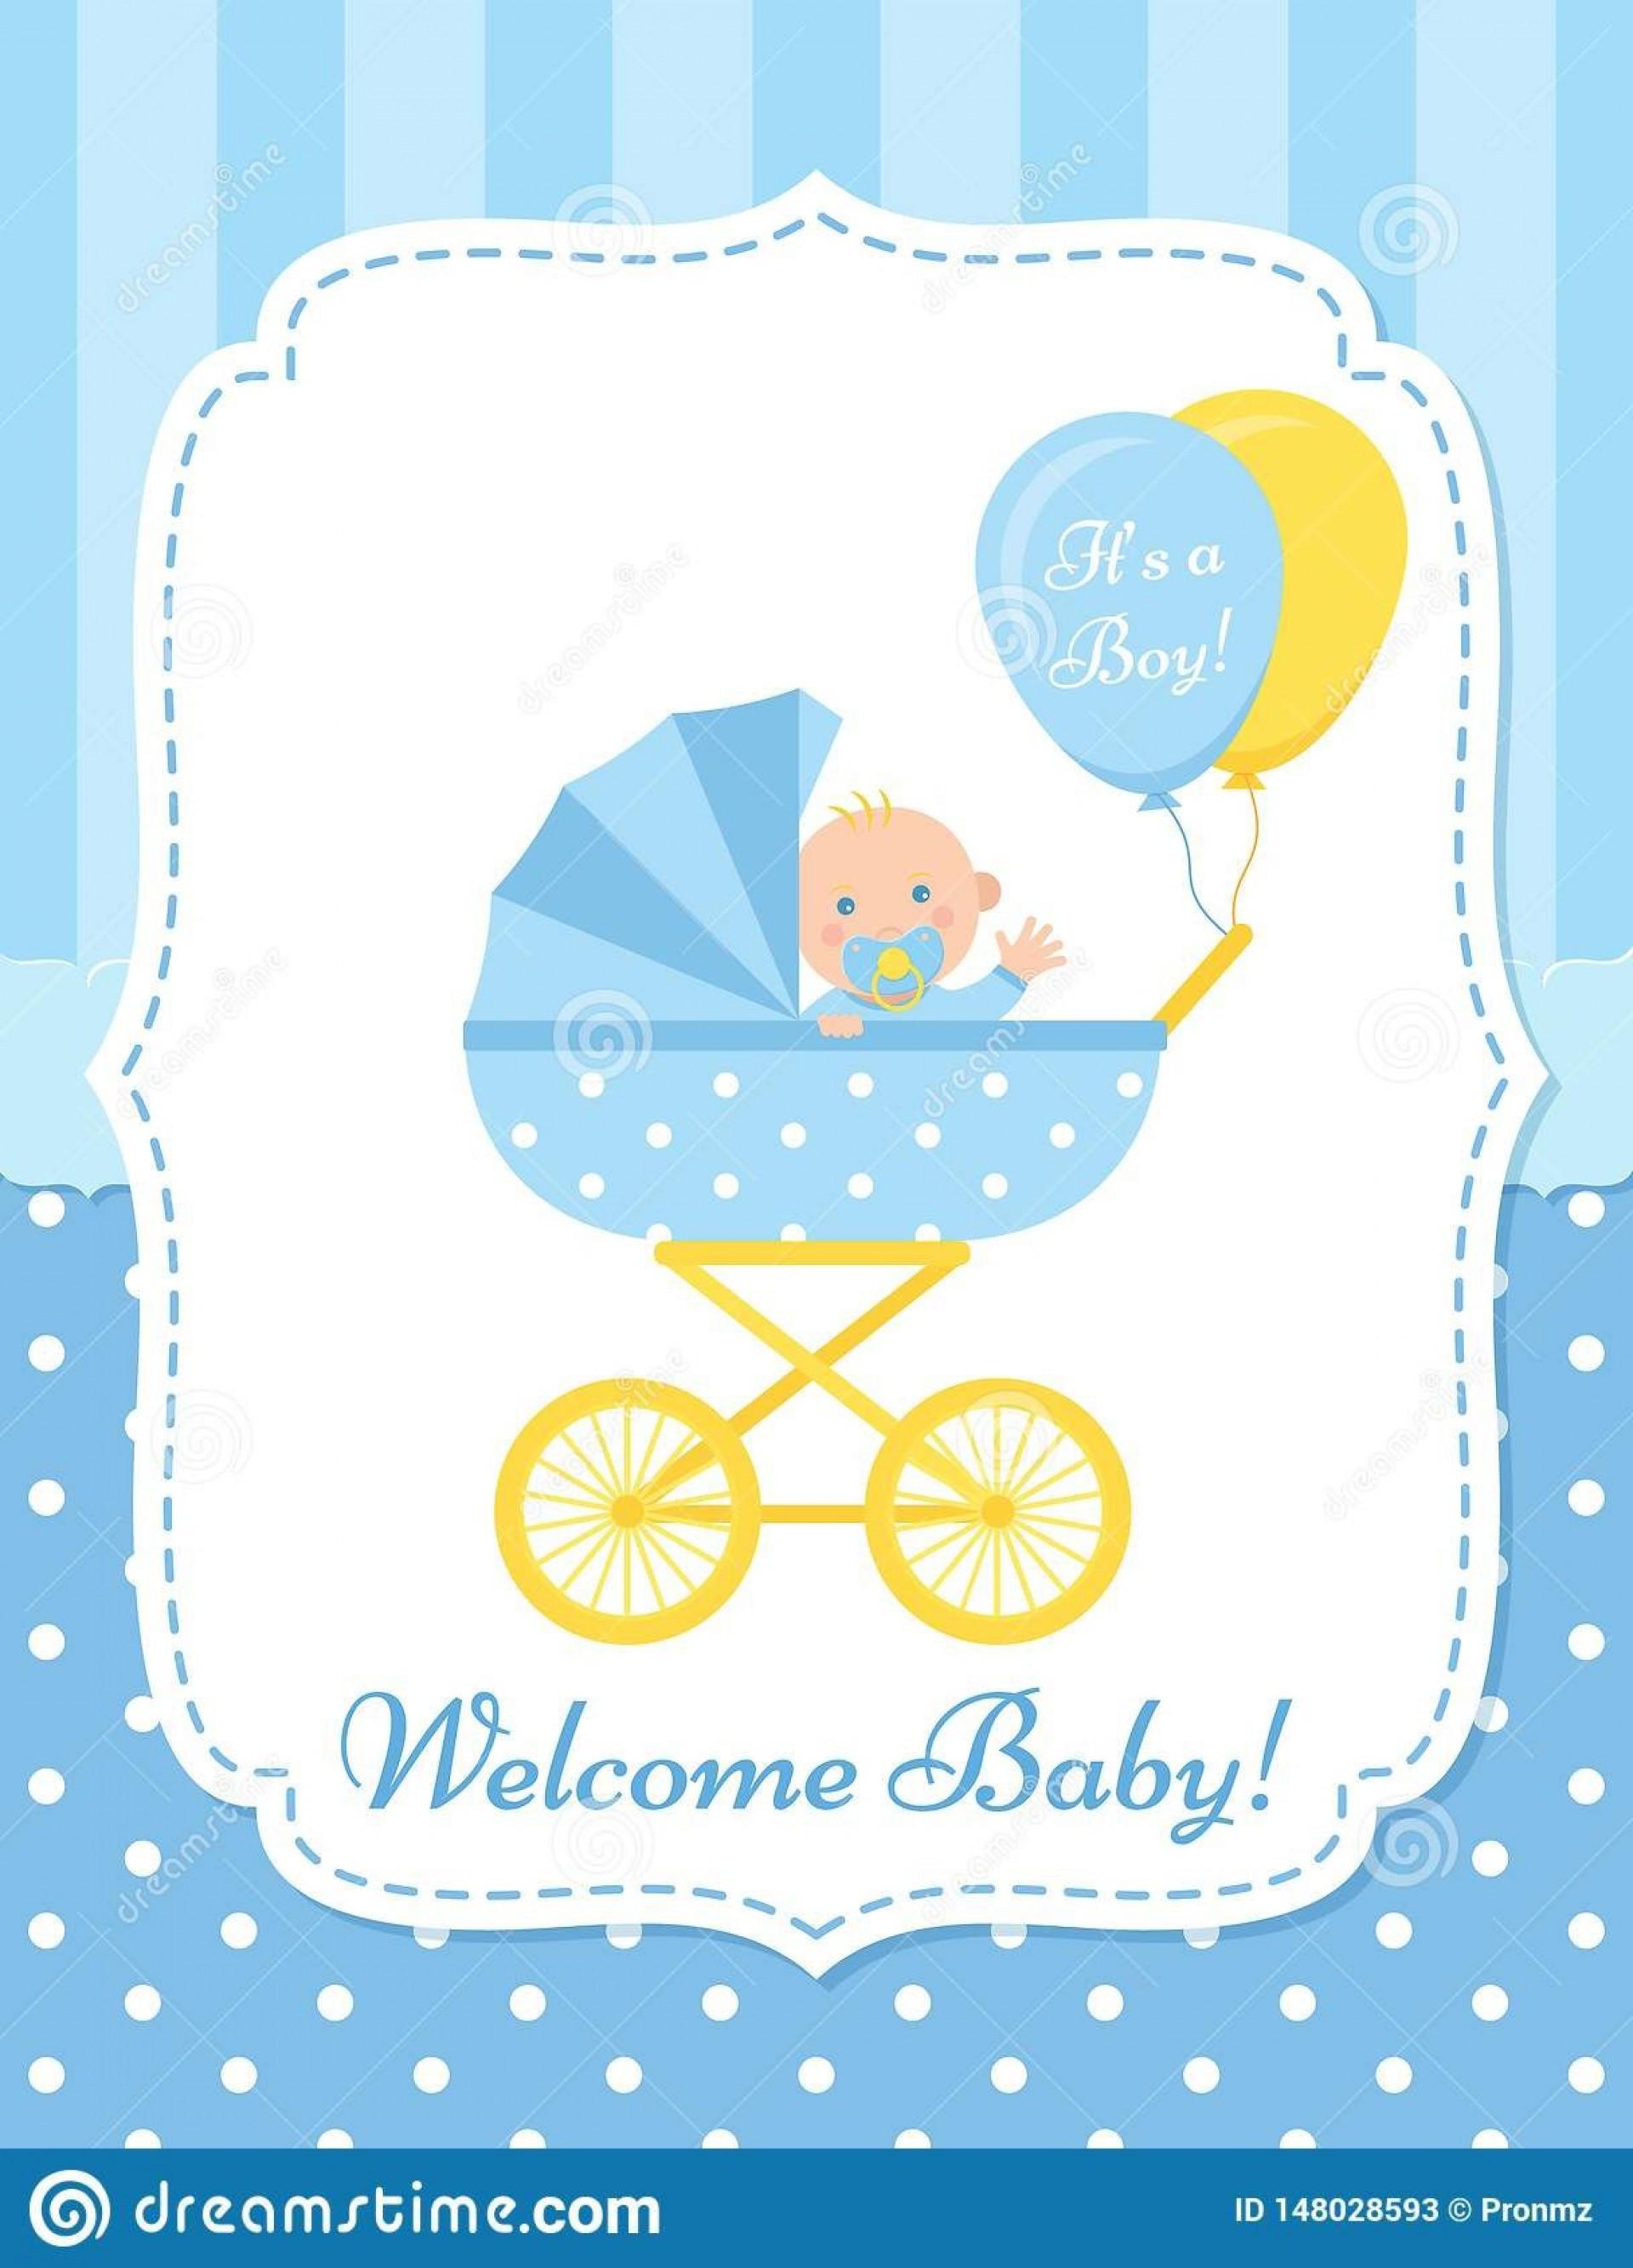 004 Striking Free Printable Baby Shower Card For Boy High Definition  Bingo1920